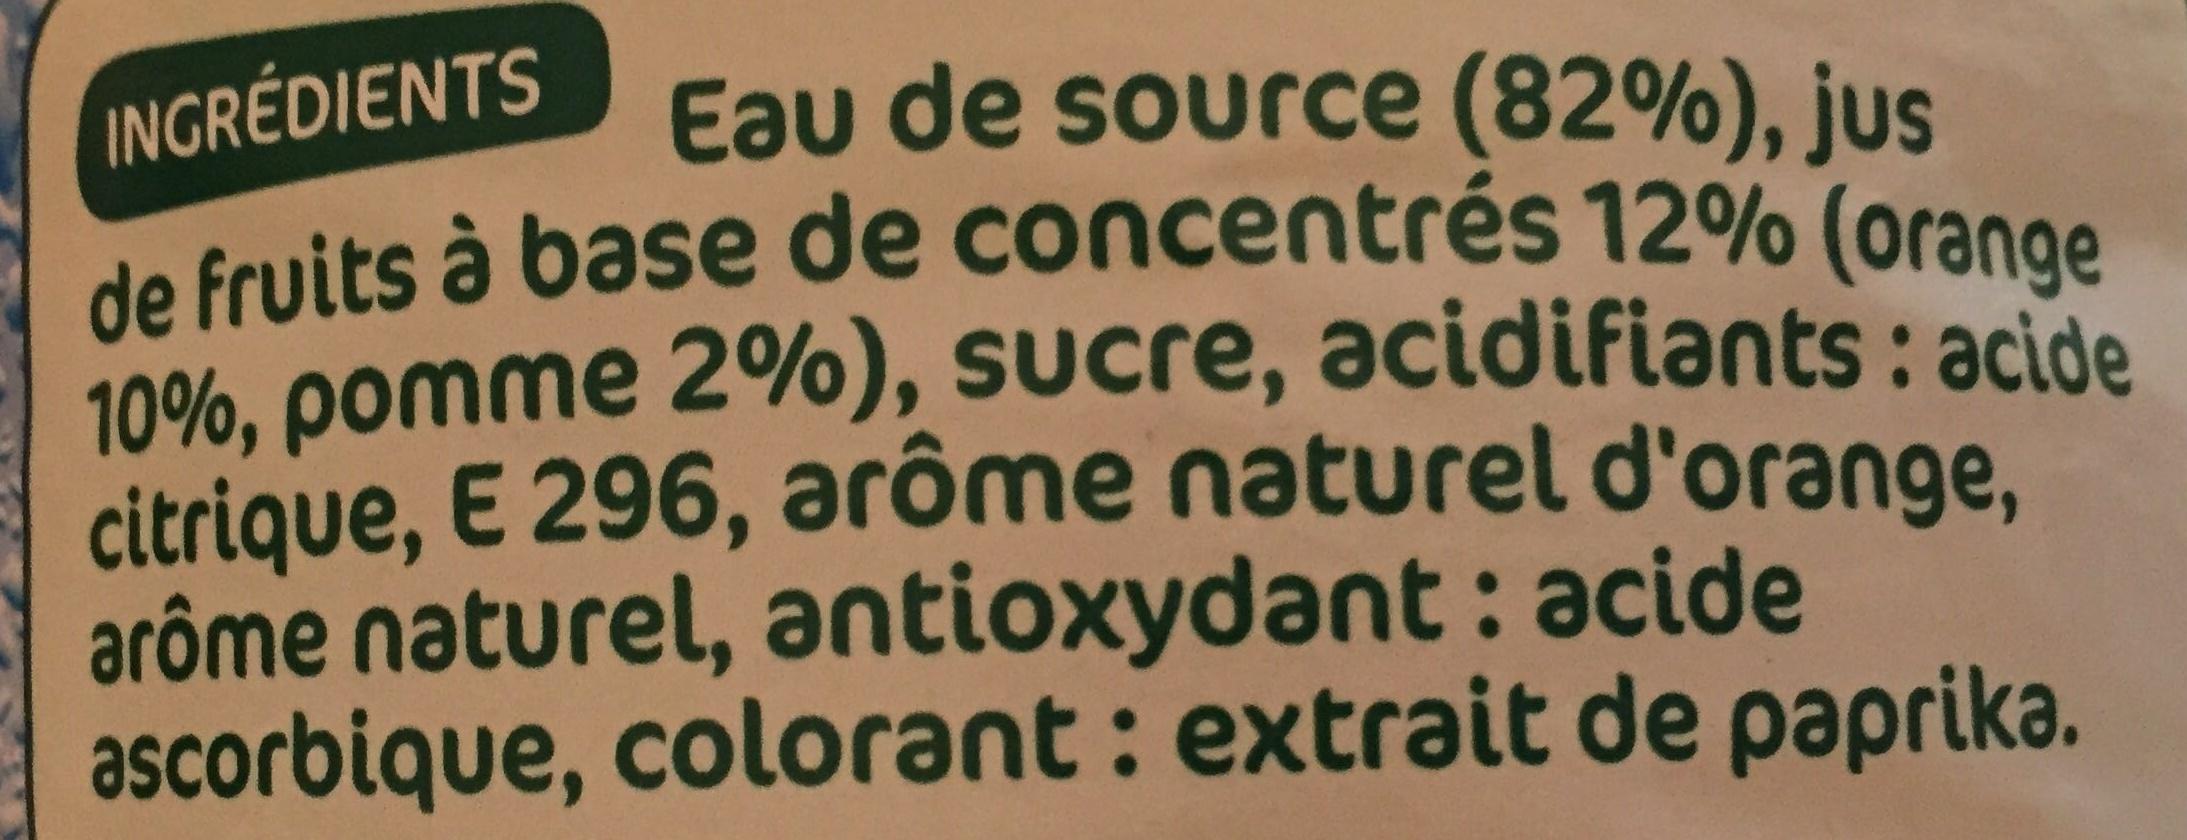 Boisson aux fruits orange - Ingredients